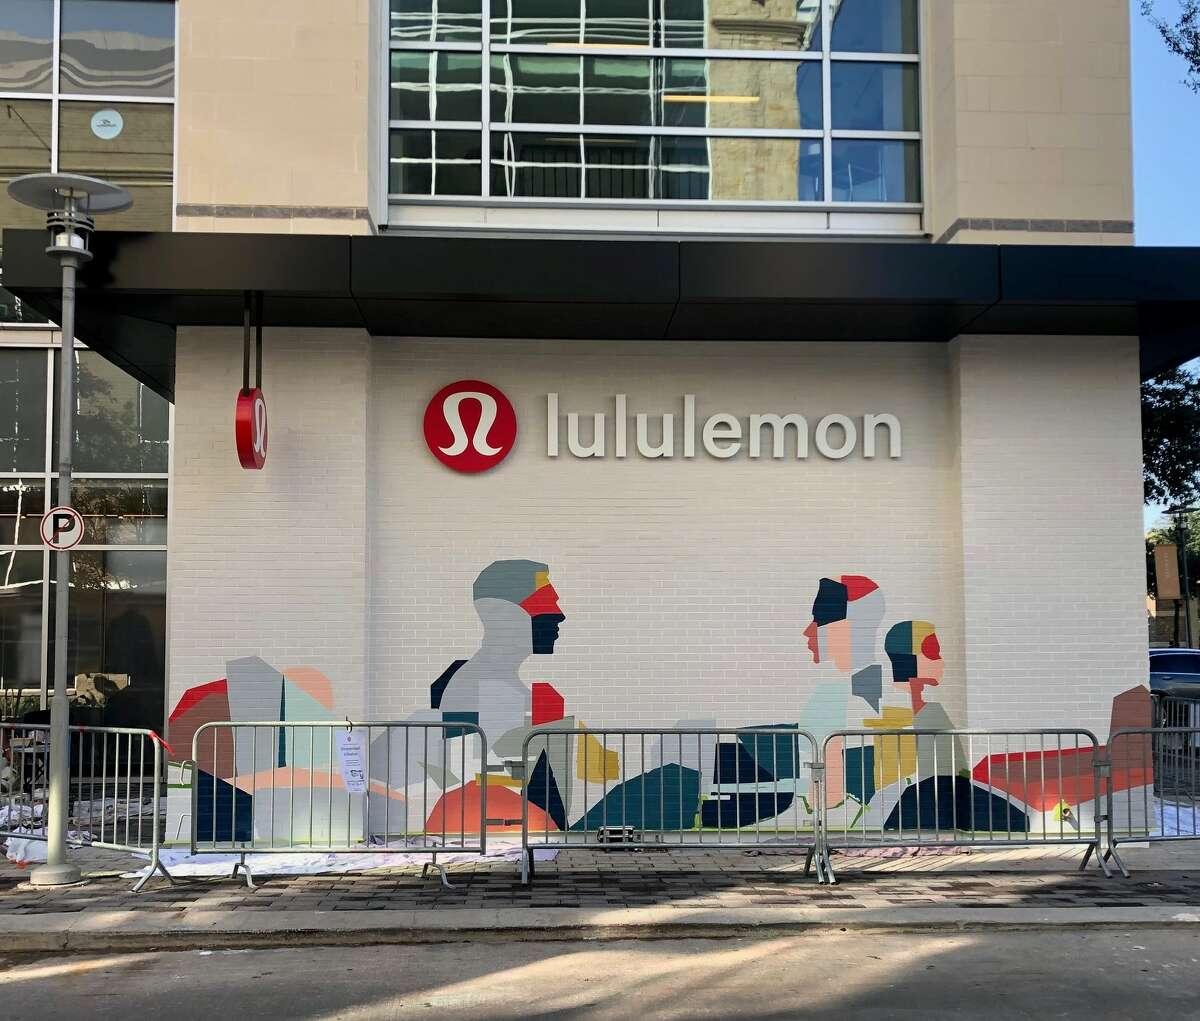 Houston artist Hugo Pérez created the Mind over Matter mural at lululemon's CityCentre store in west Houston.